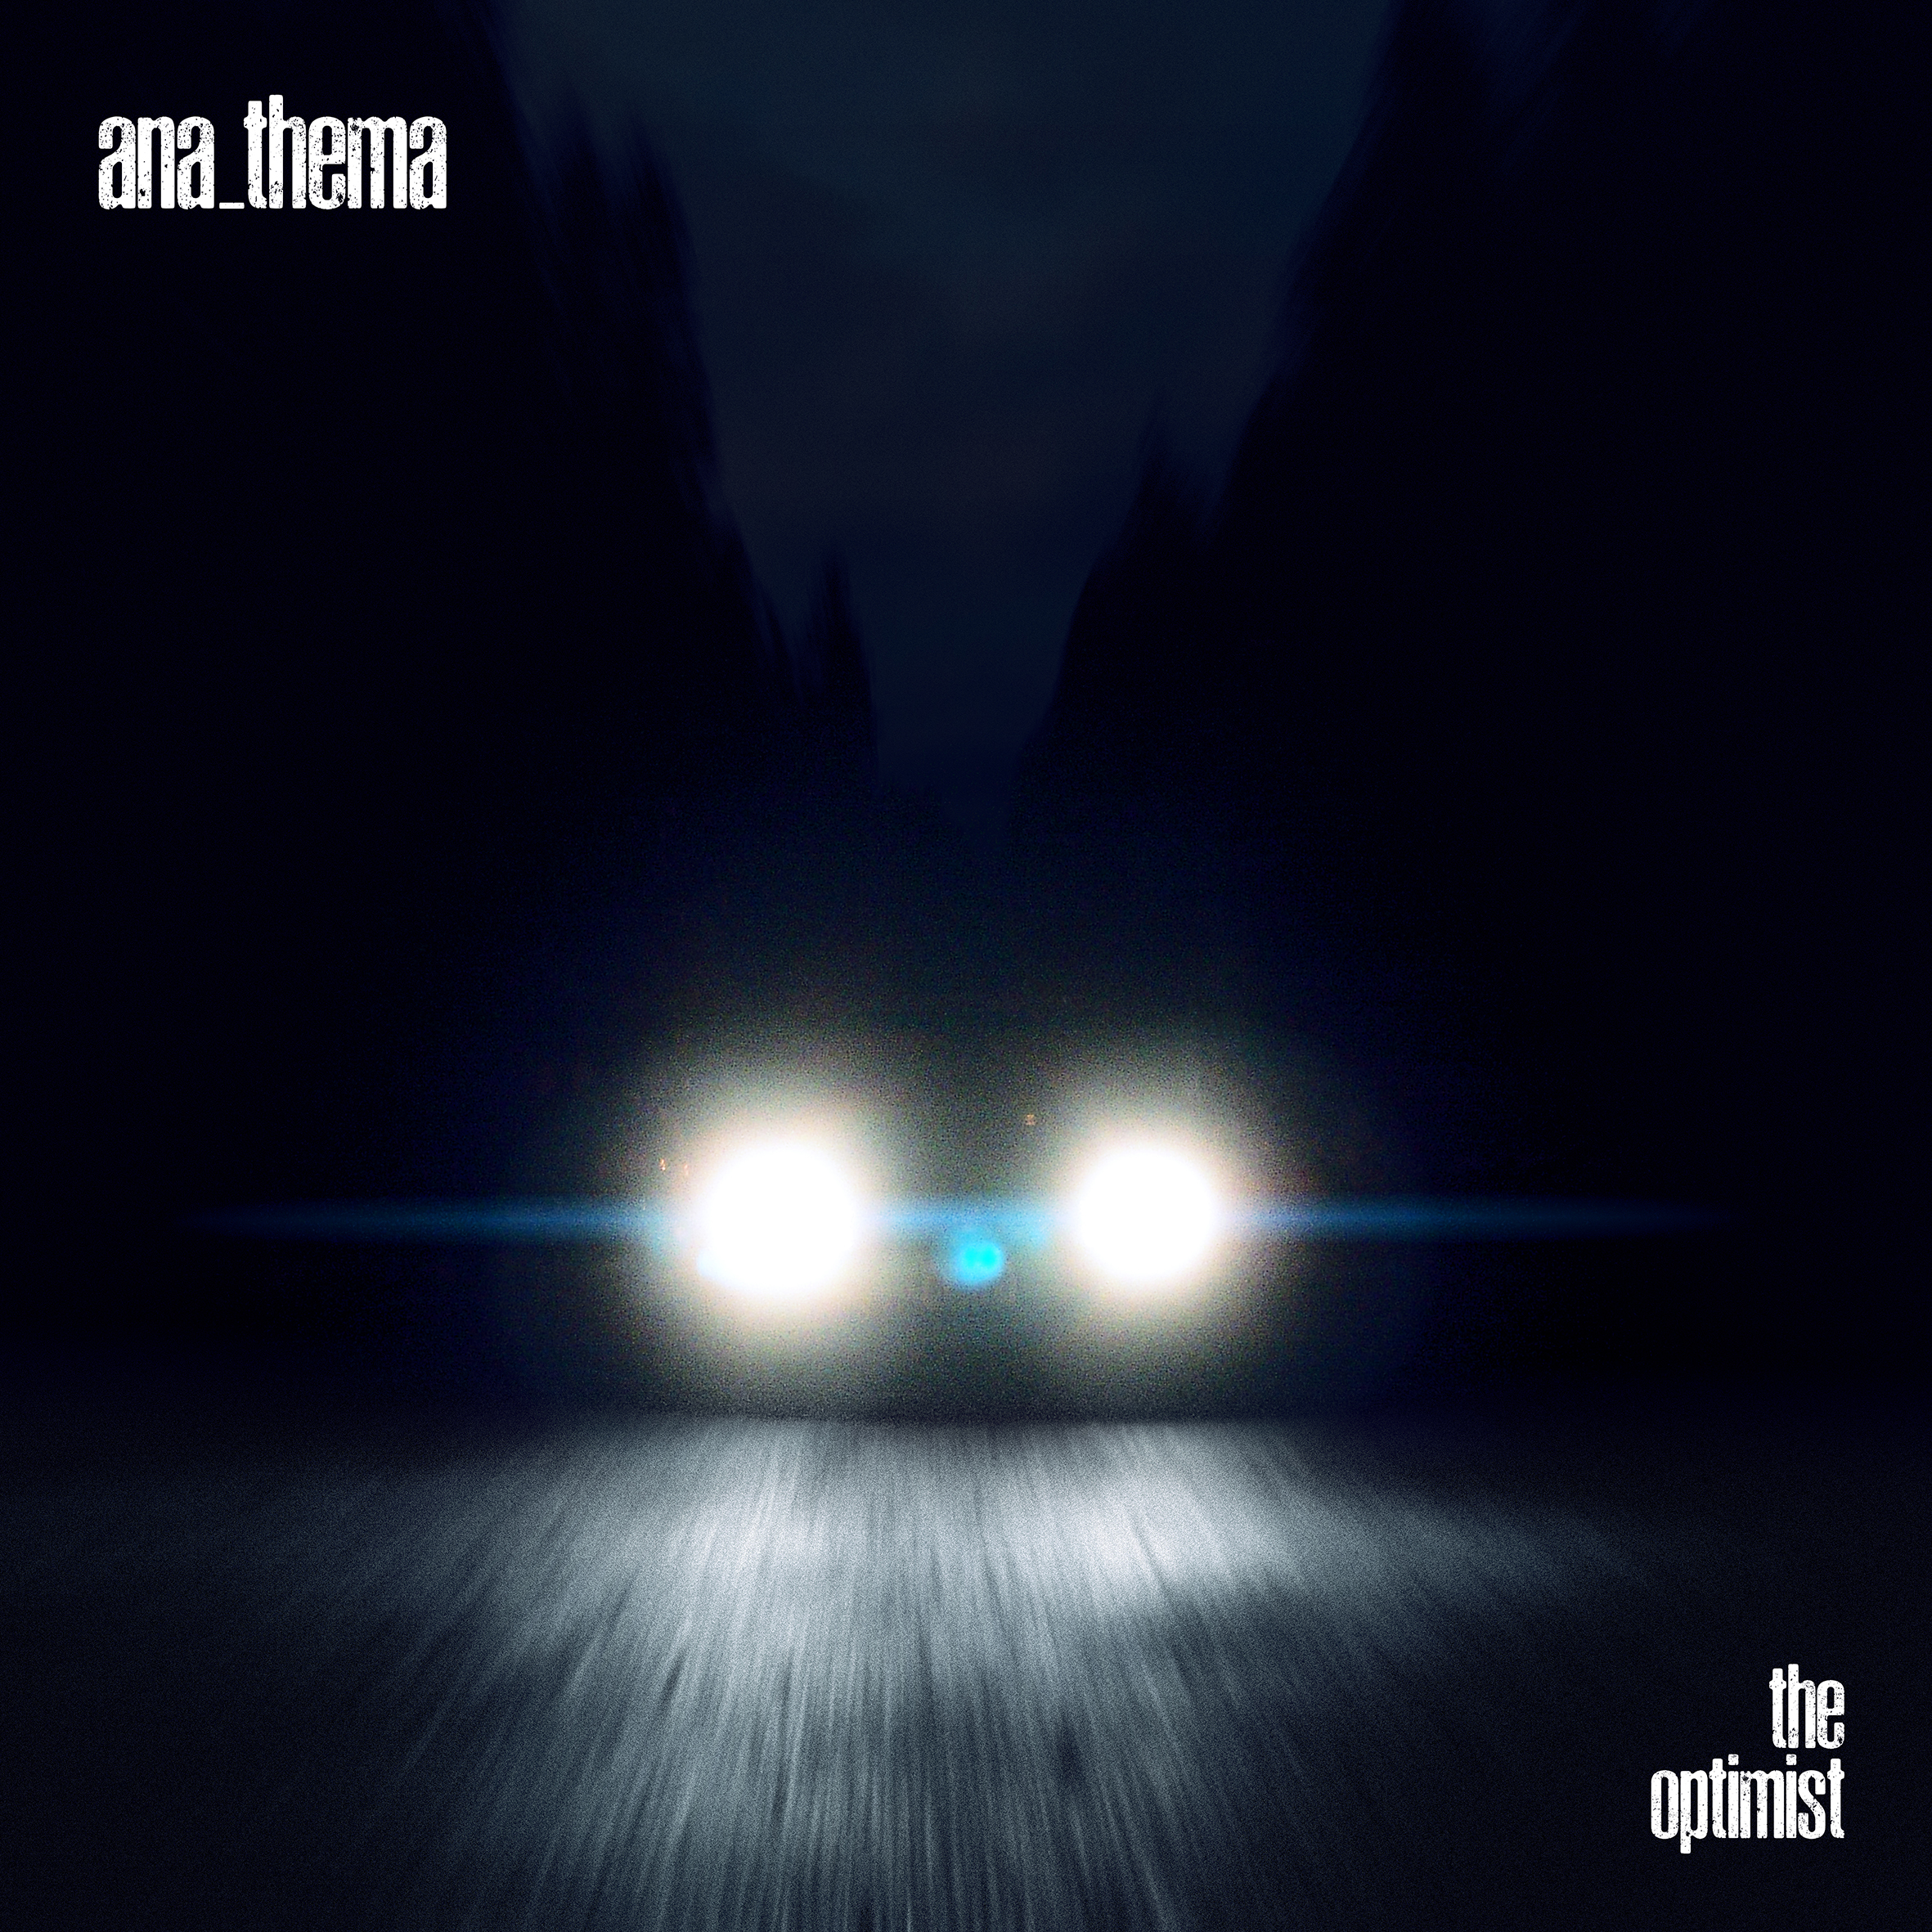 Anathema – The Optimist